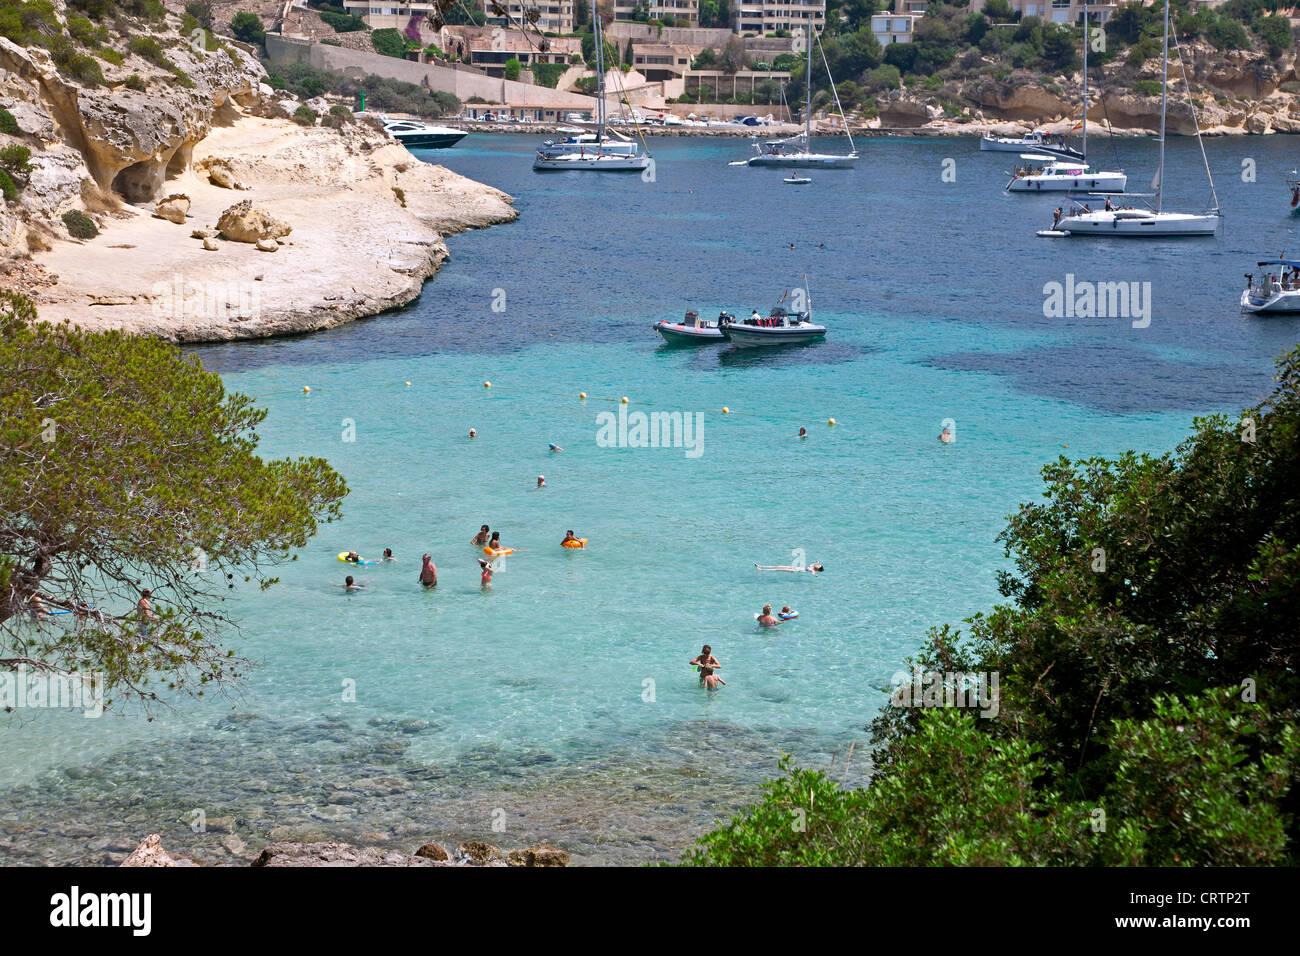 Portals Vells beach. Mallorca. Spain - Stock Image